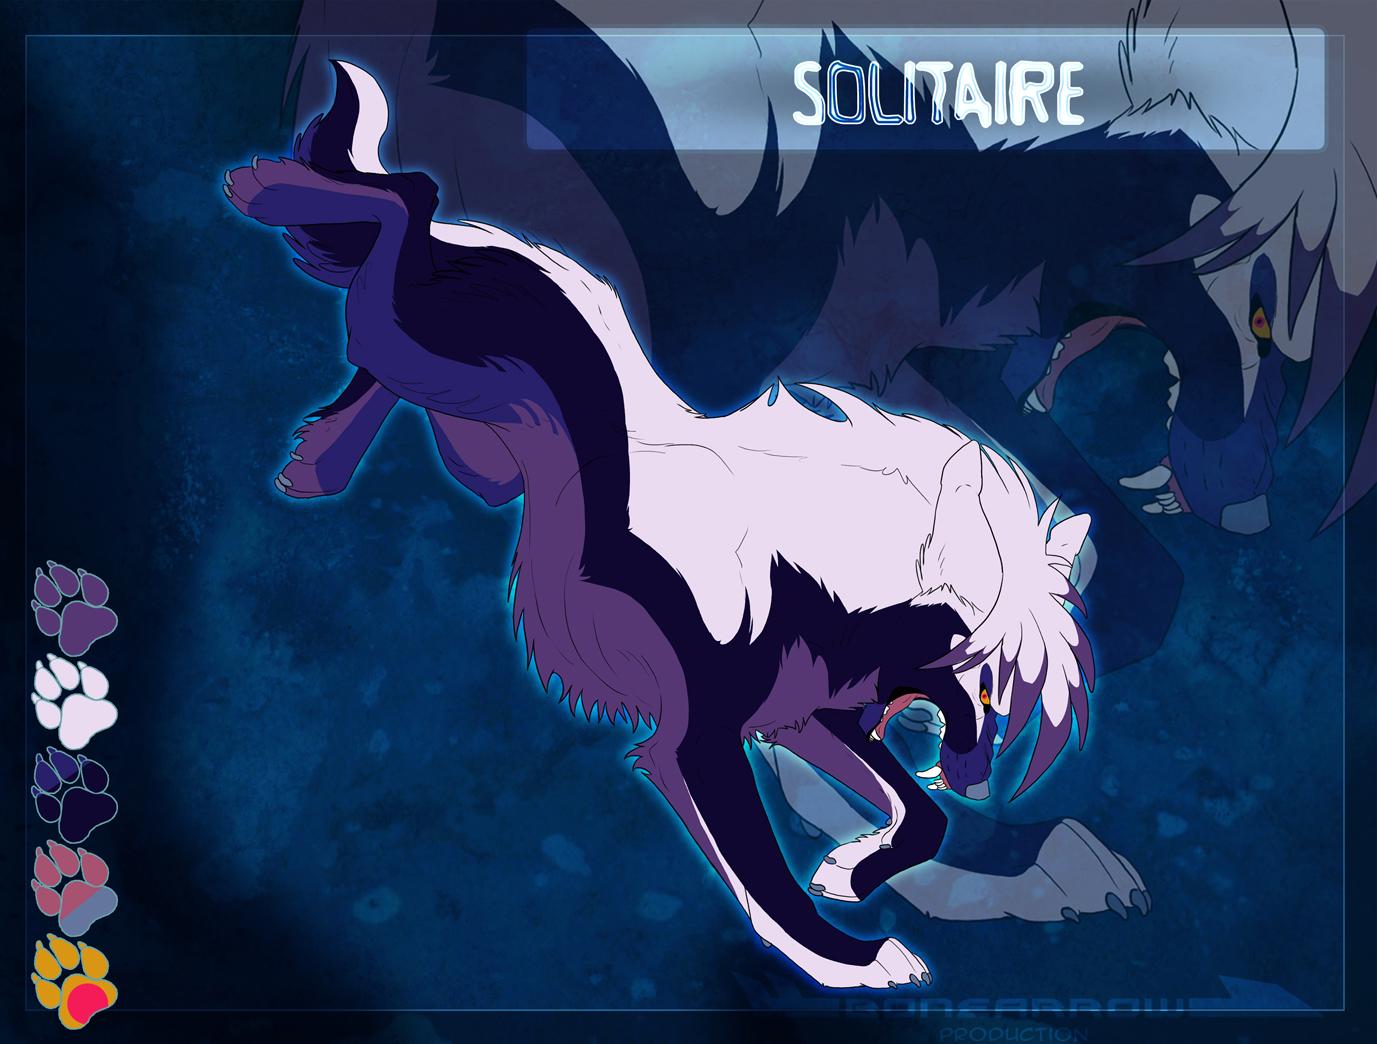 dddsssssss Soh__solitaire_cs_by_icekrystal-d31avv9